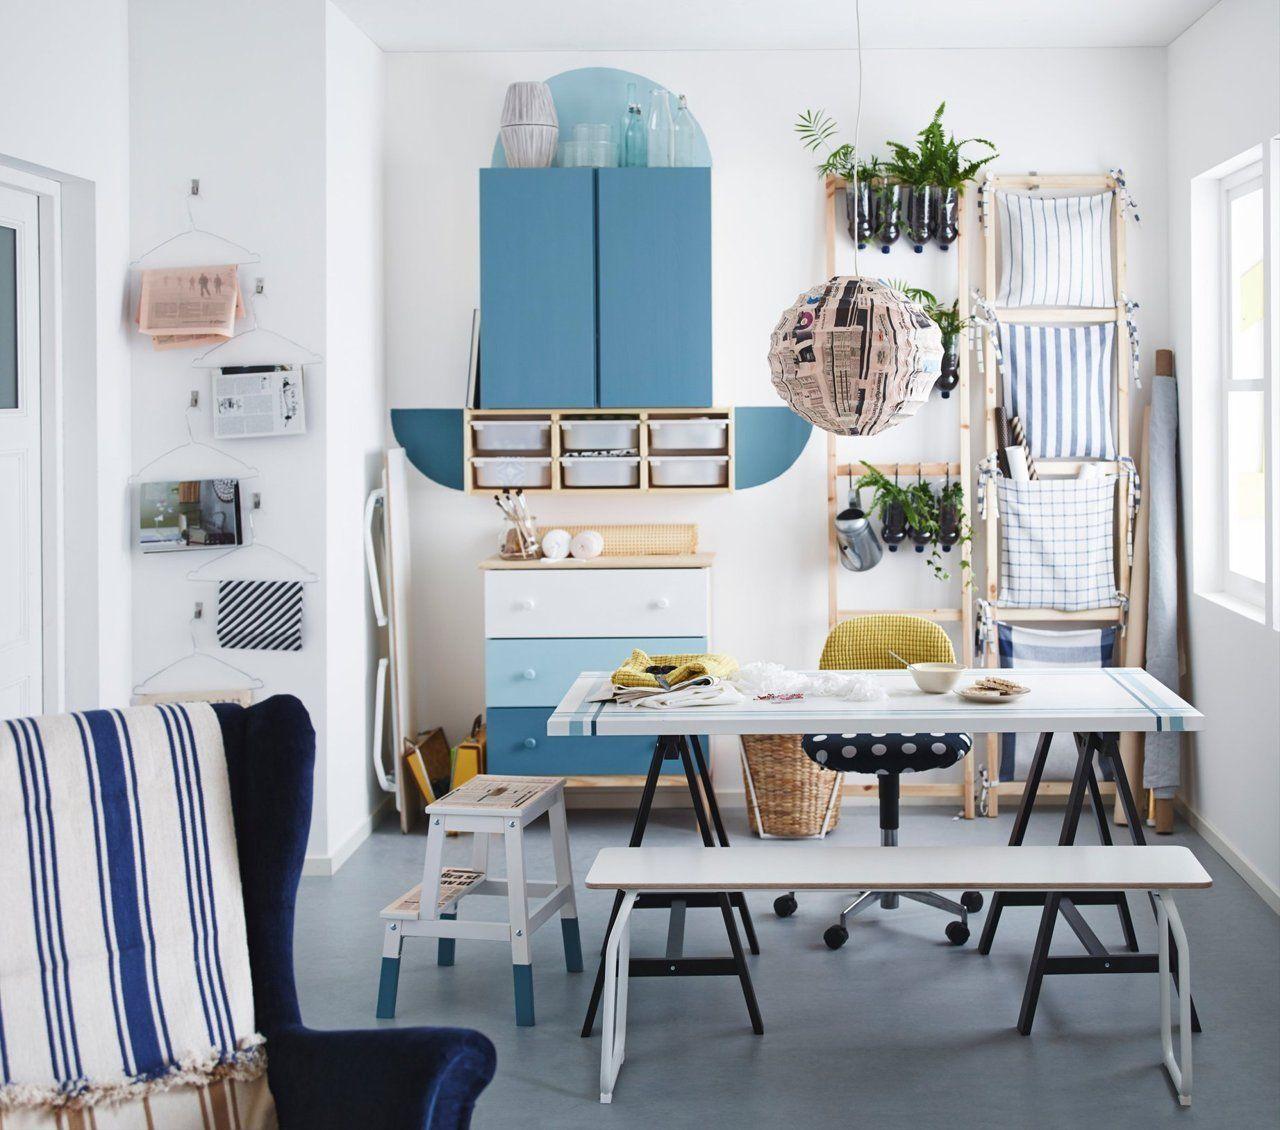 Best beds designs, ikea furniture online store home ...